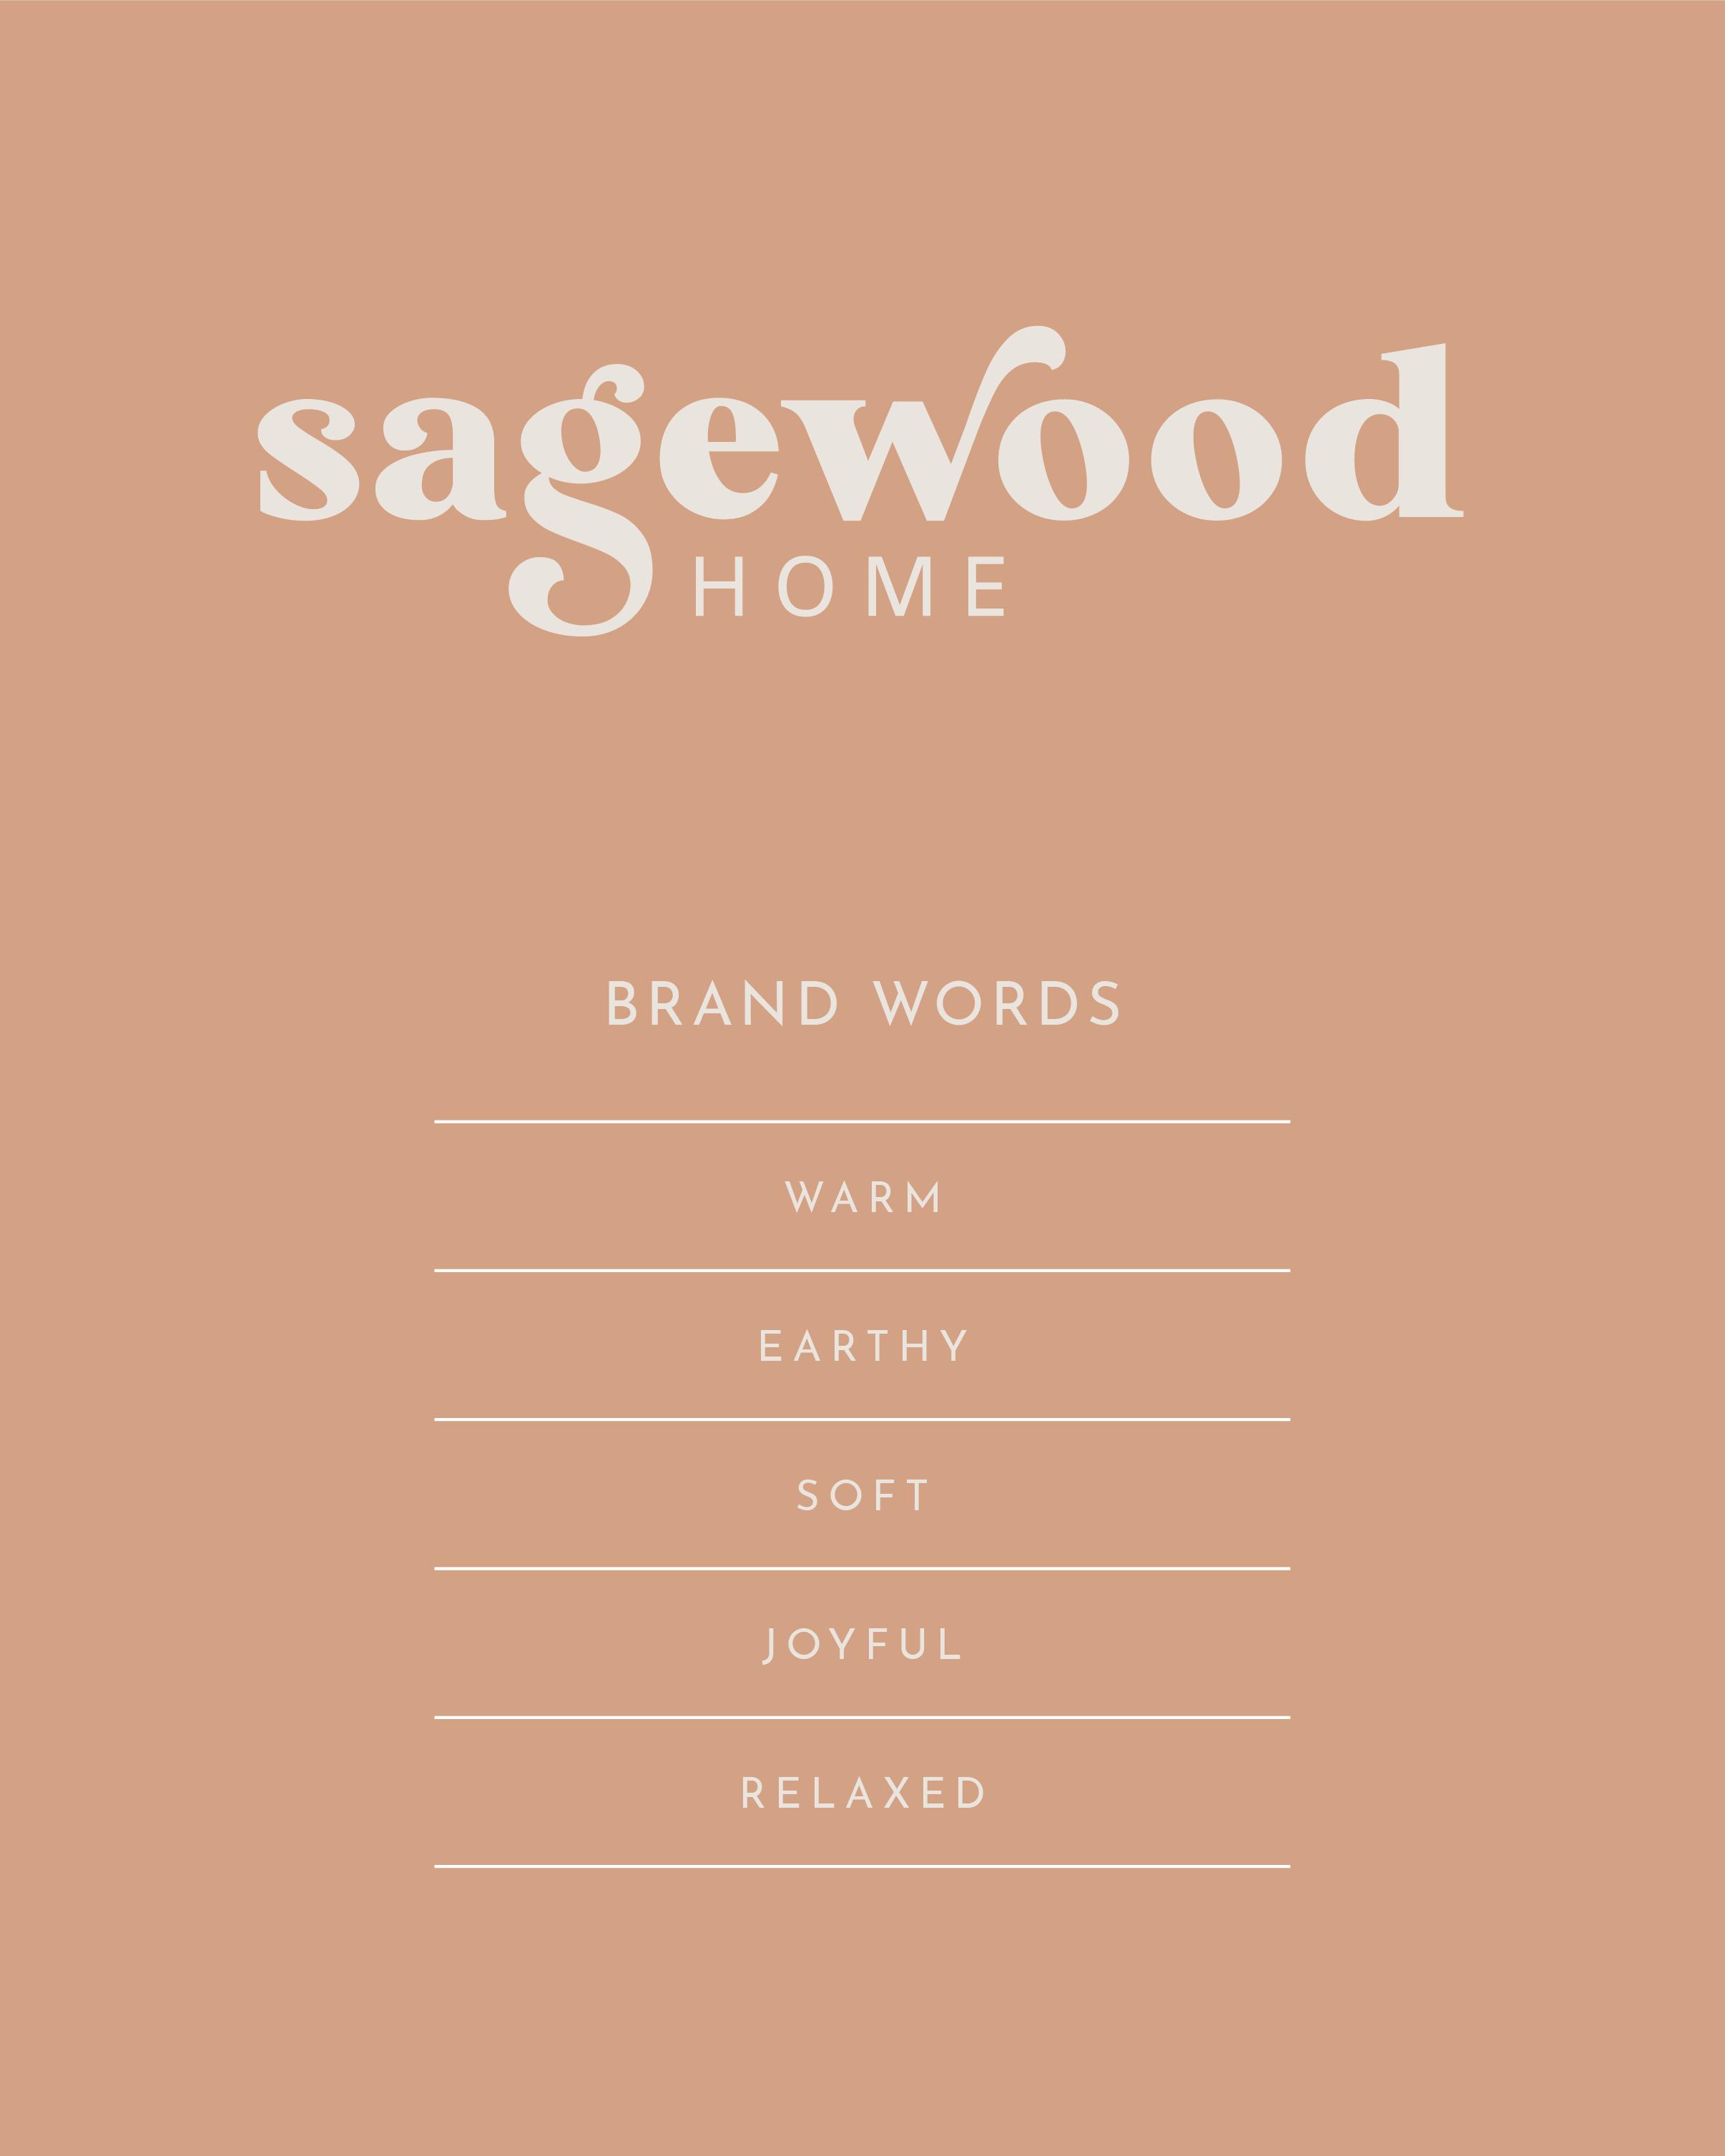 SagewoodHome_Portfolio_BrandWords.png